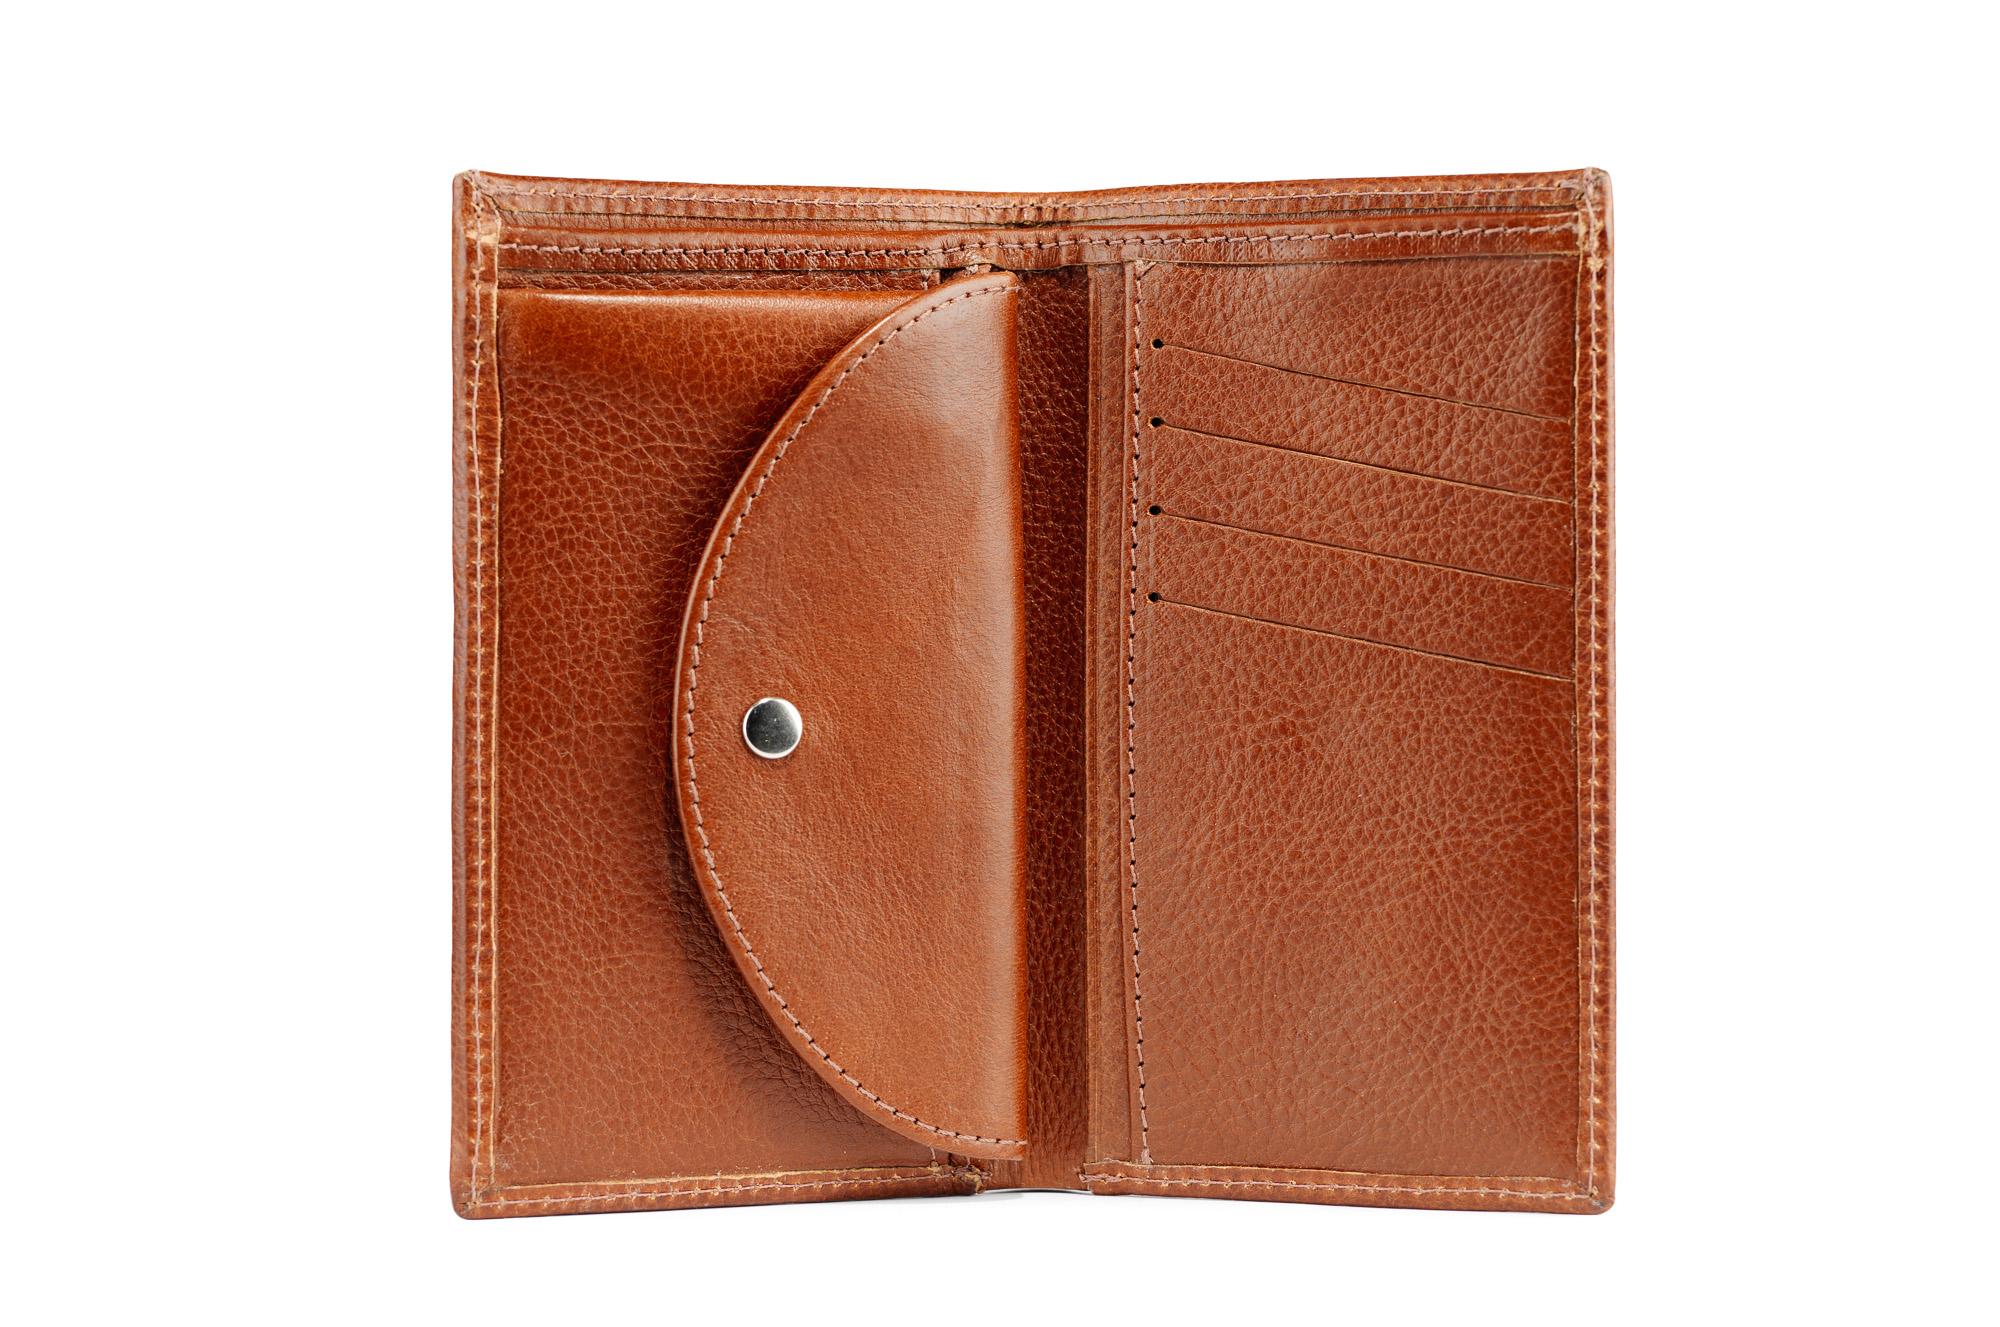 Holden Ladies Medium Leather Wallet Chestnut Inside Copy QC.jpg